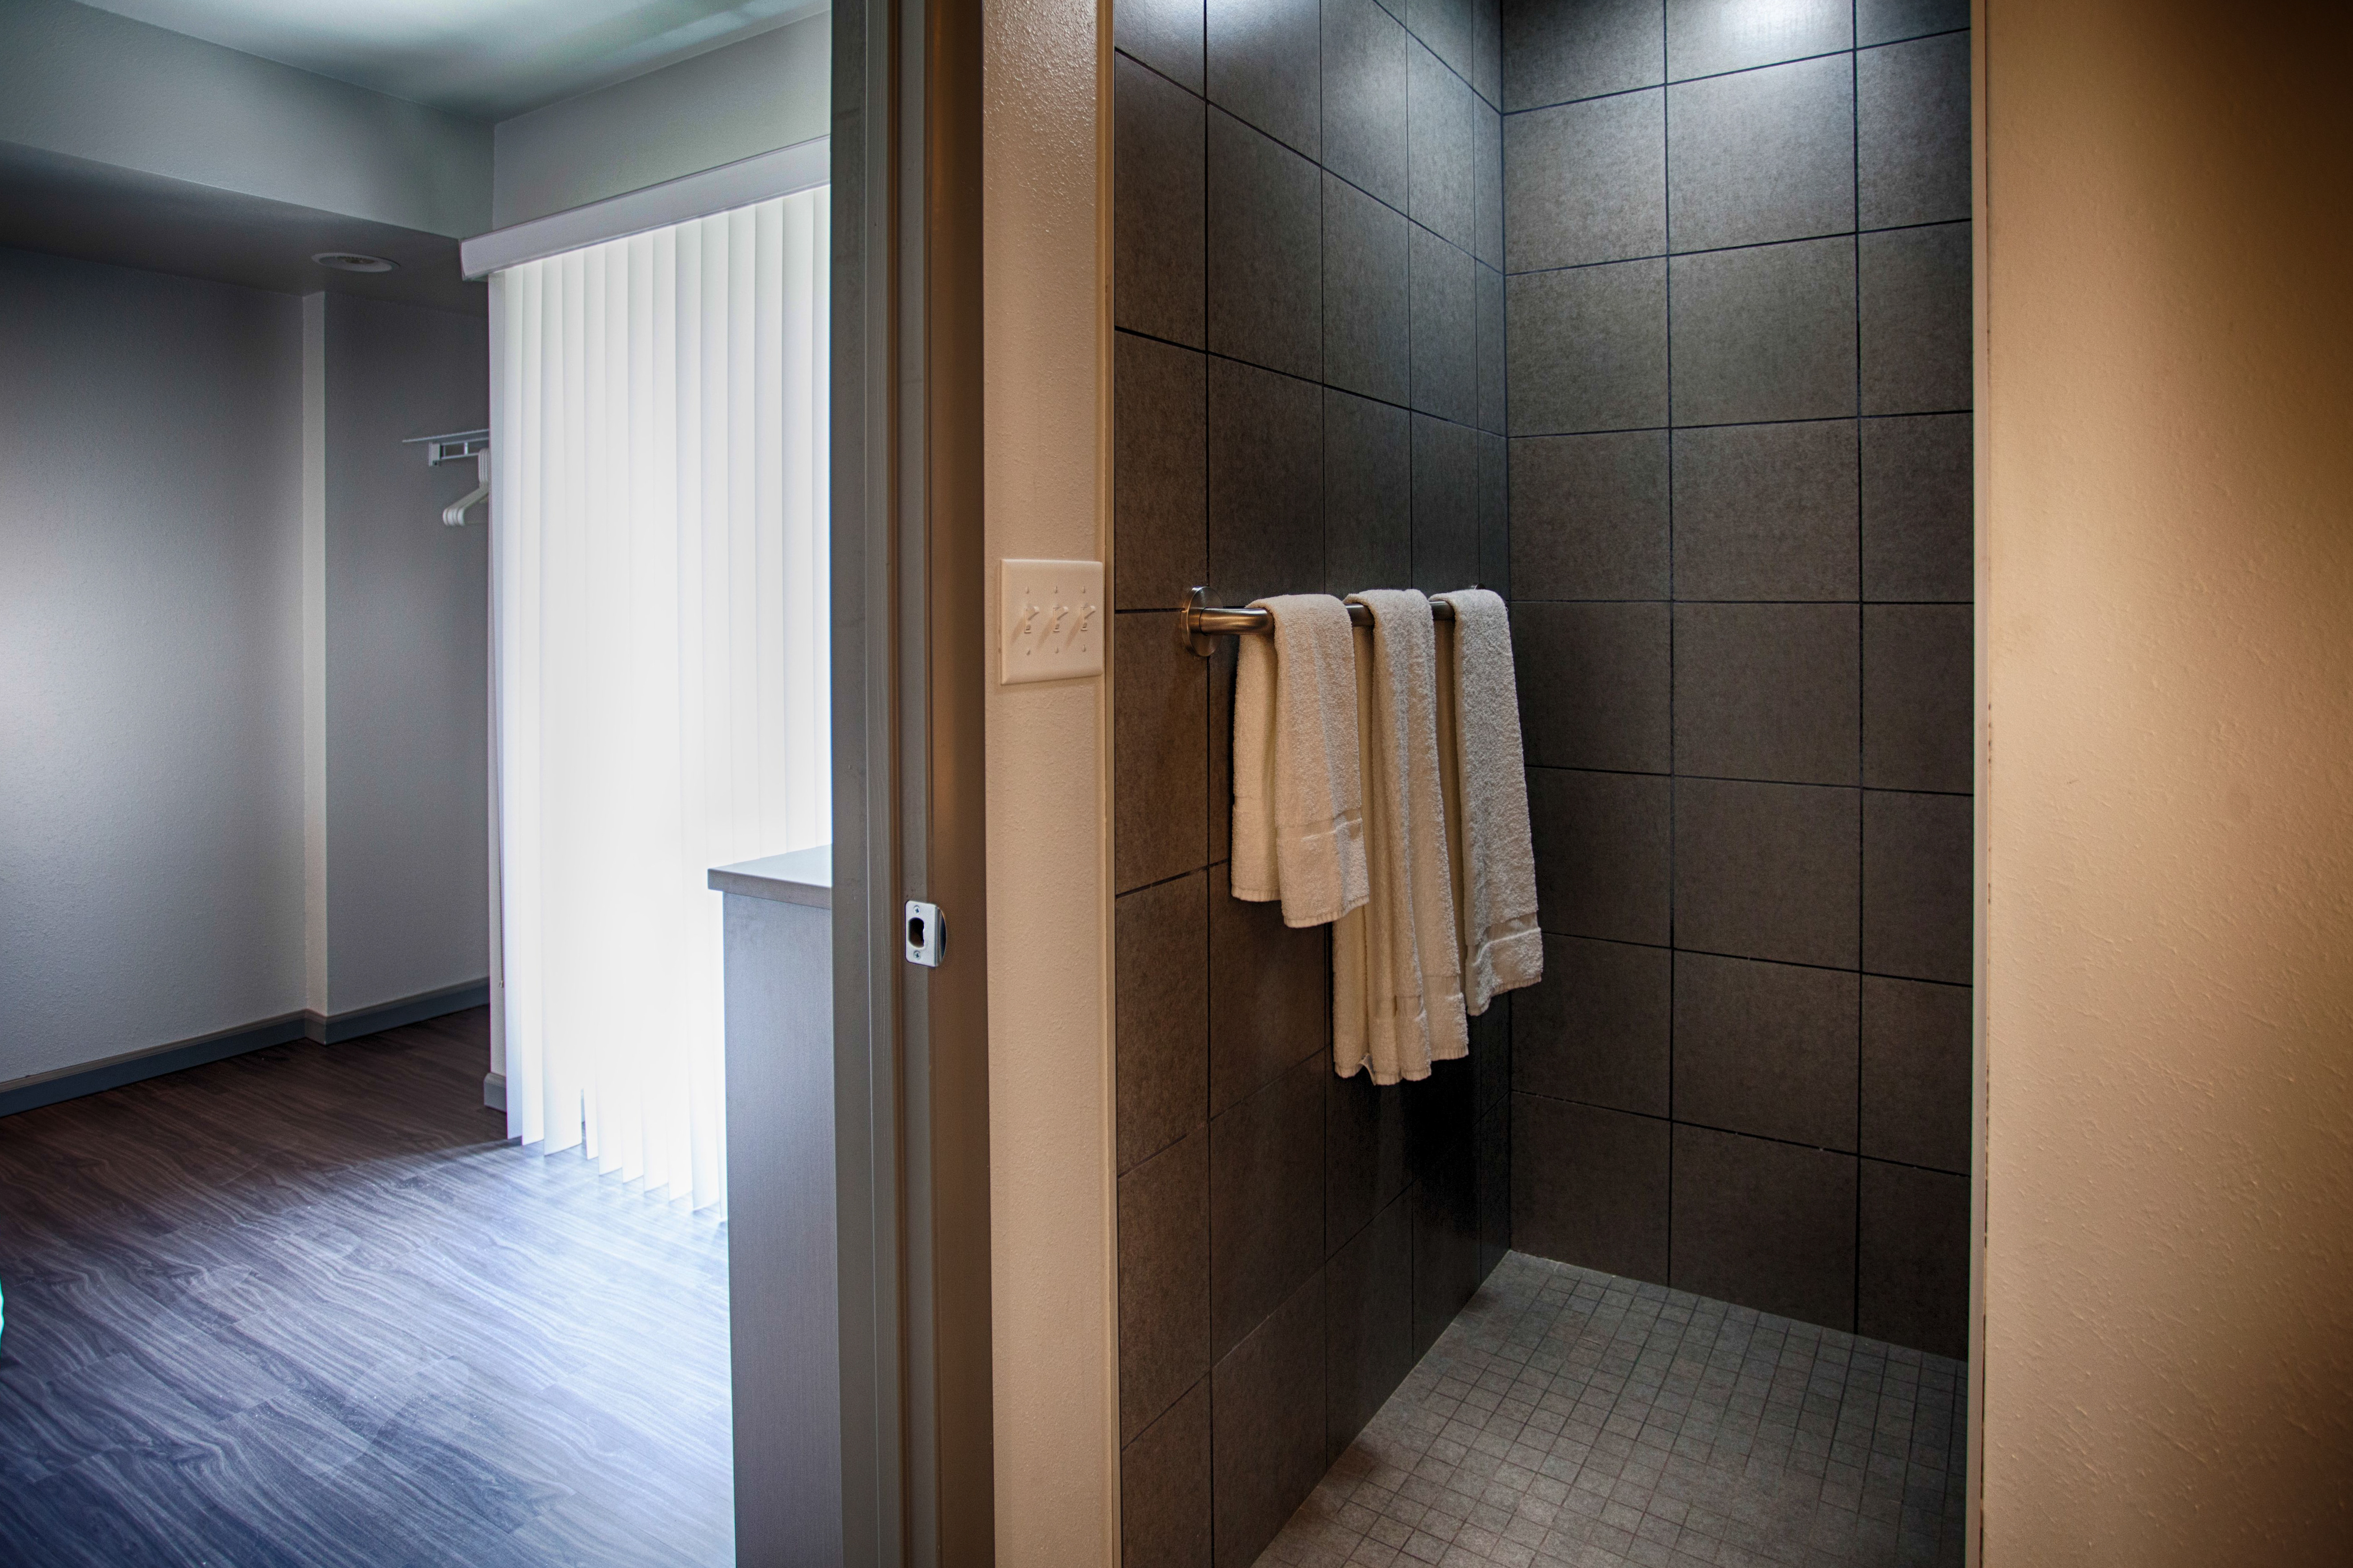 Hotel Rooms In St Robert Mo Z Loft Hotel St Robert